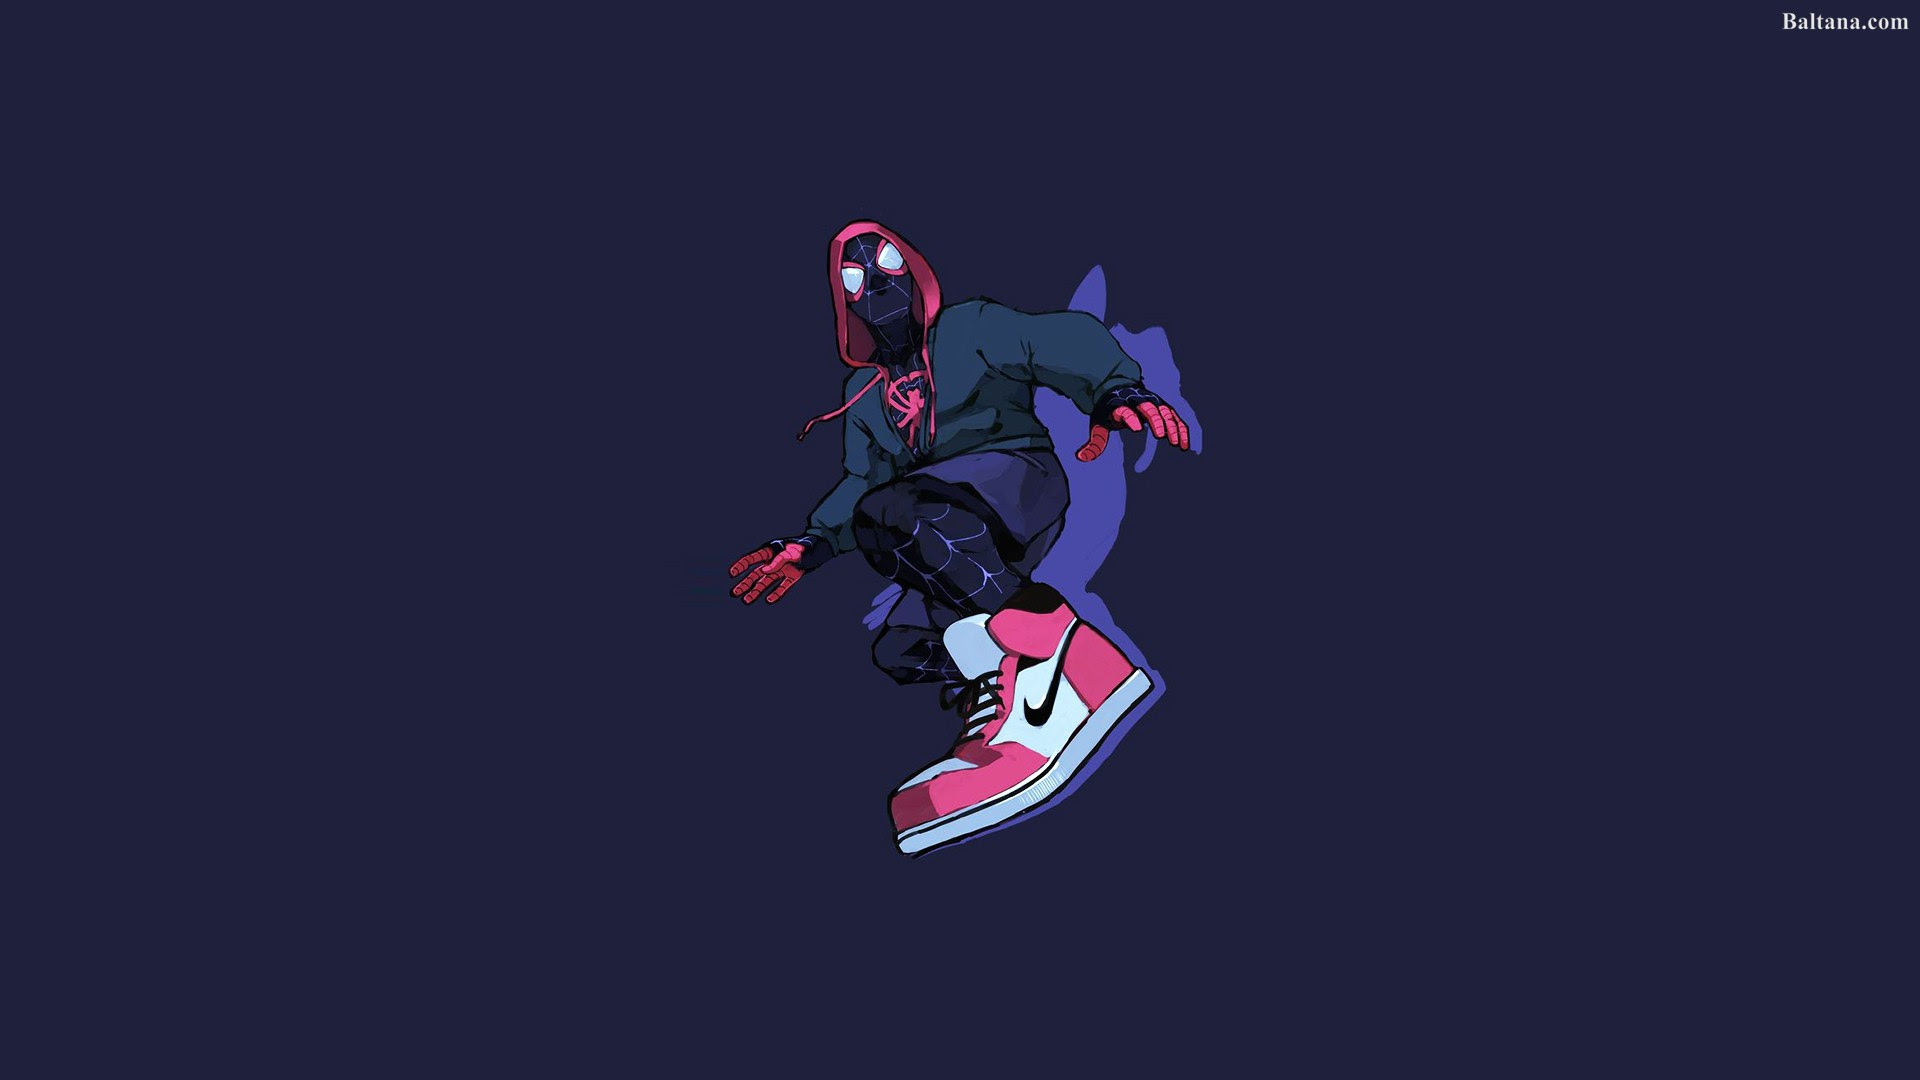 Spiderman Into The Spider Verse HQ Background Wallpaper 29950  Baltana